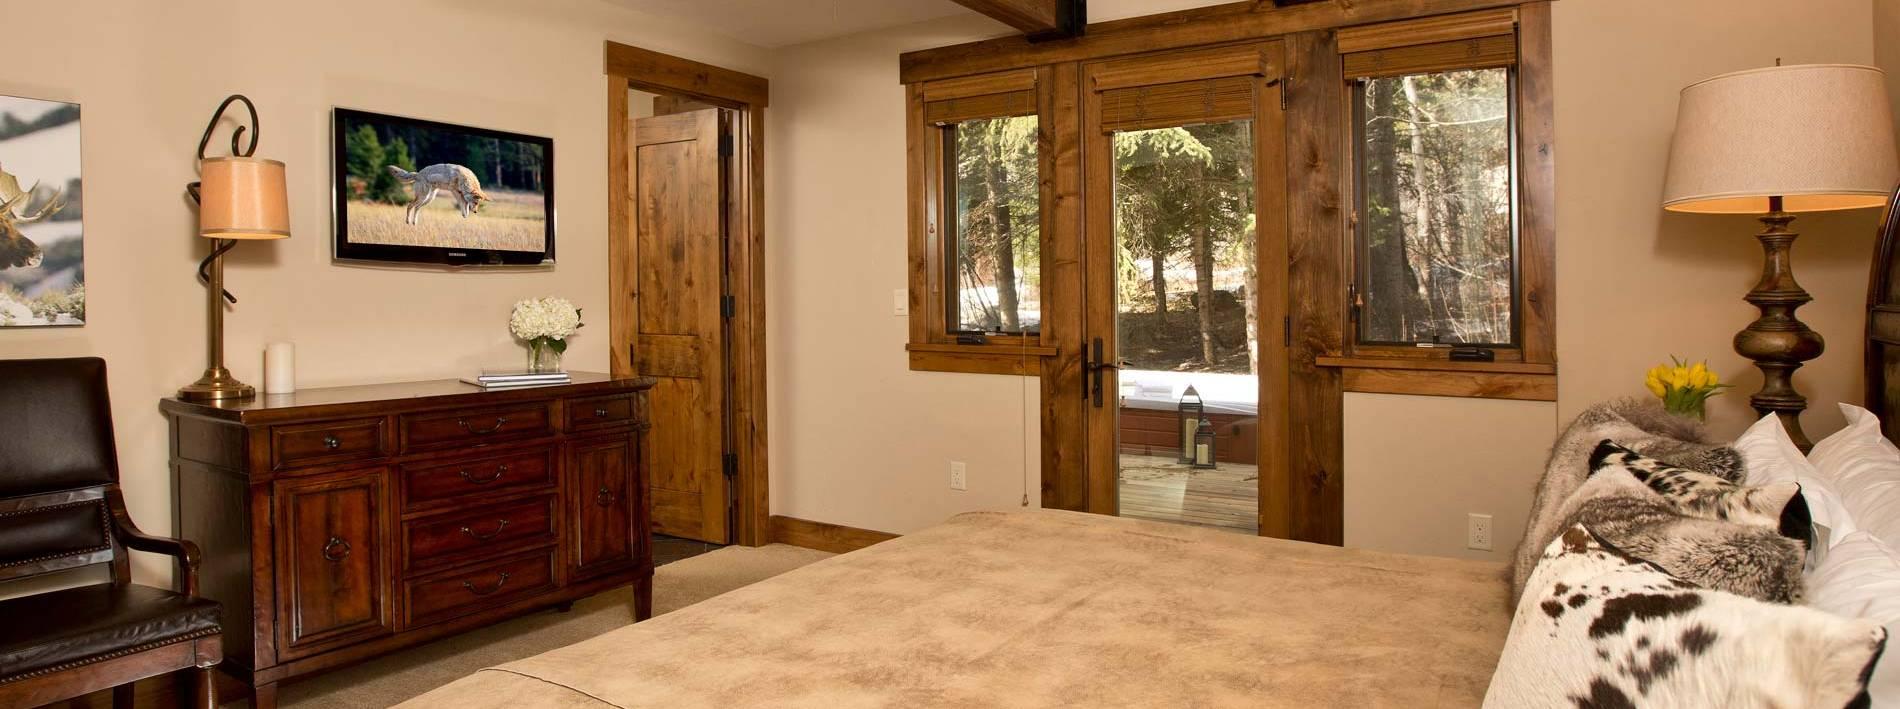 Spacious bedroom in the Blue Moose Lodge in Teton Village